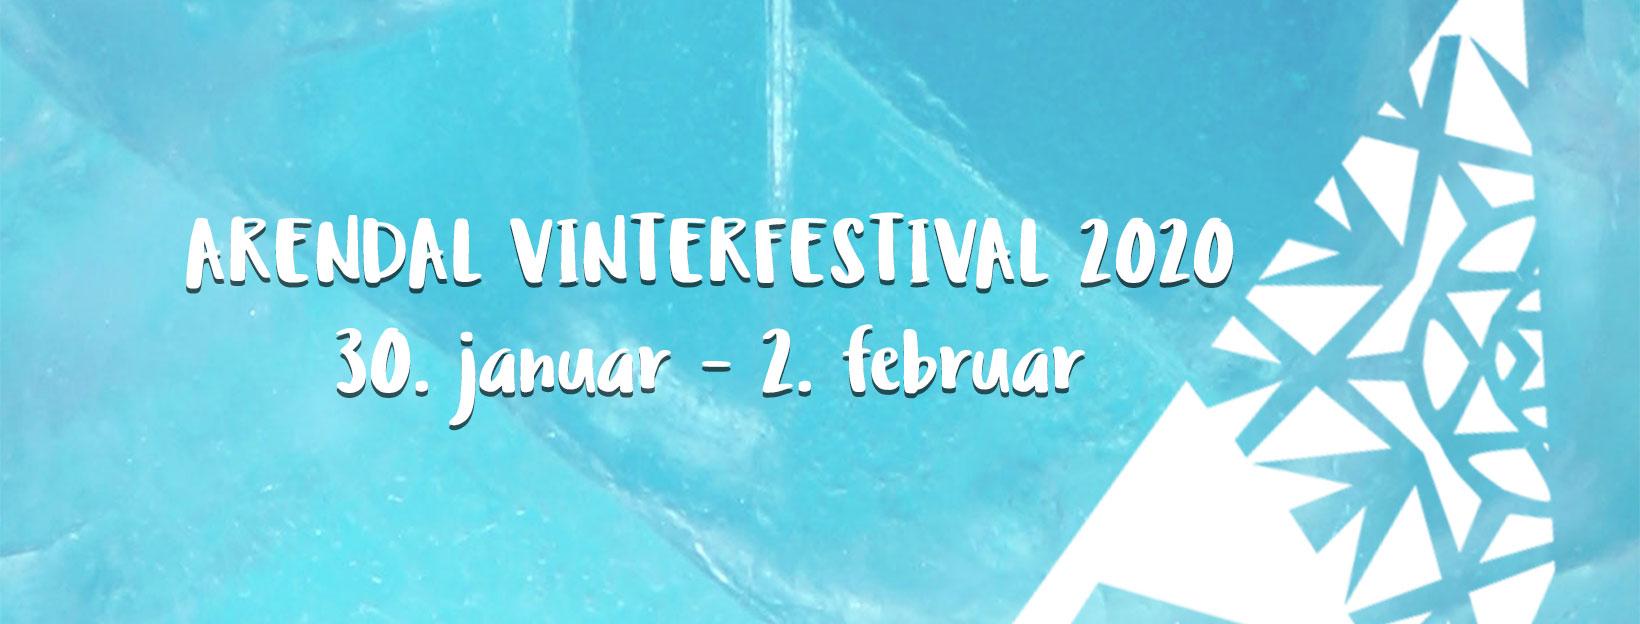 Arendal vinterfestival 2019